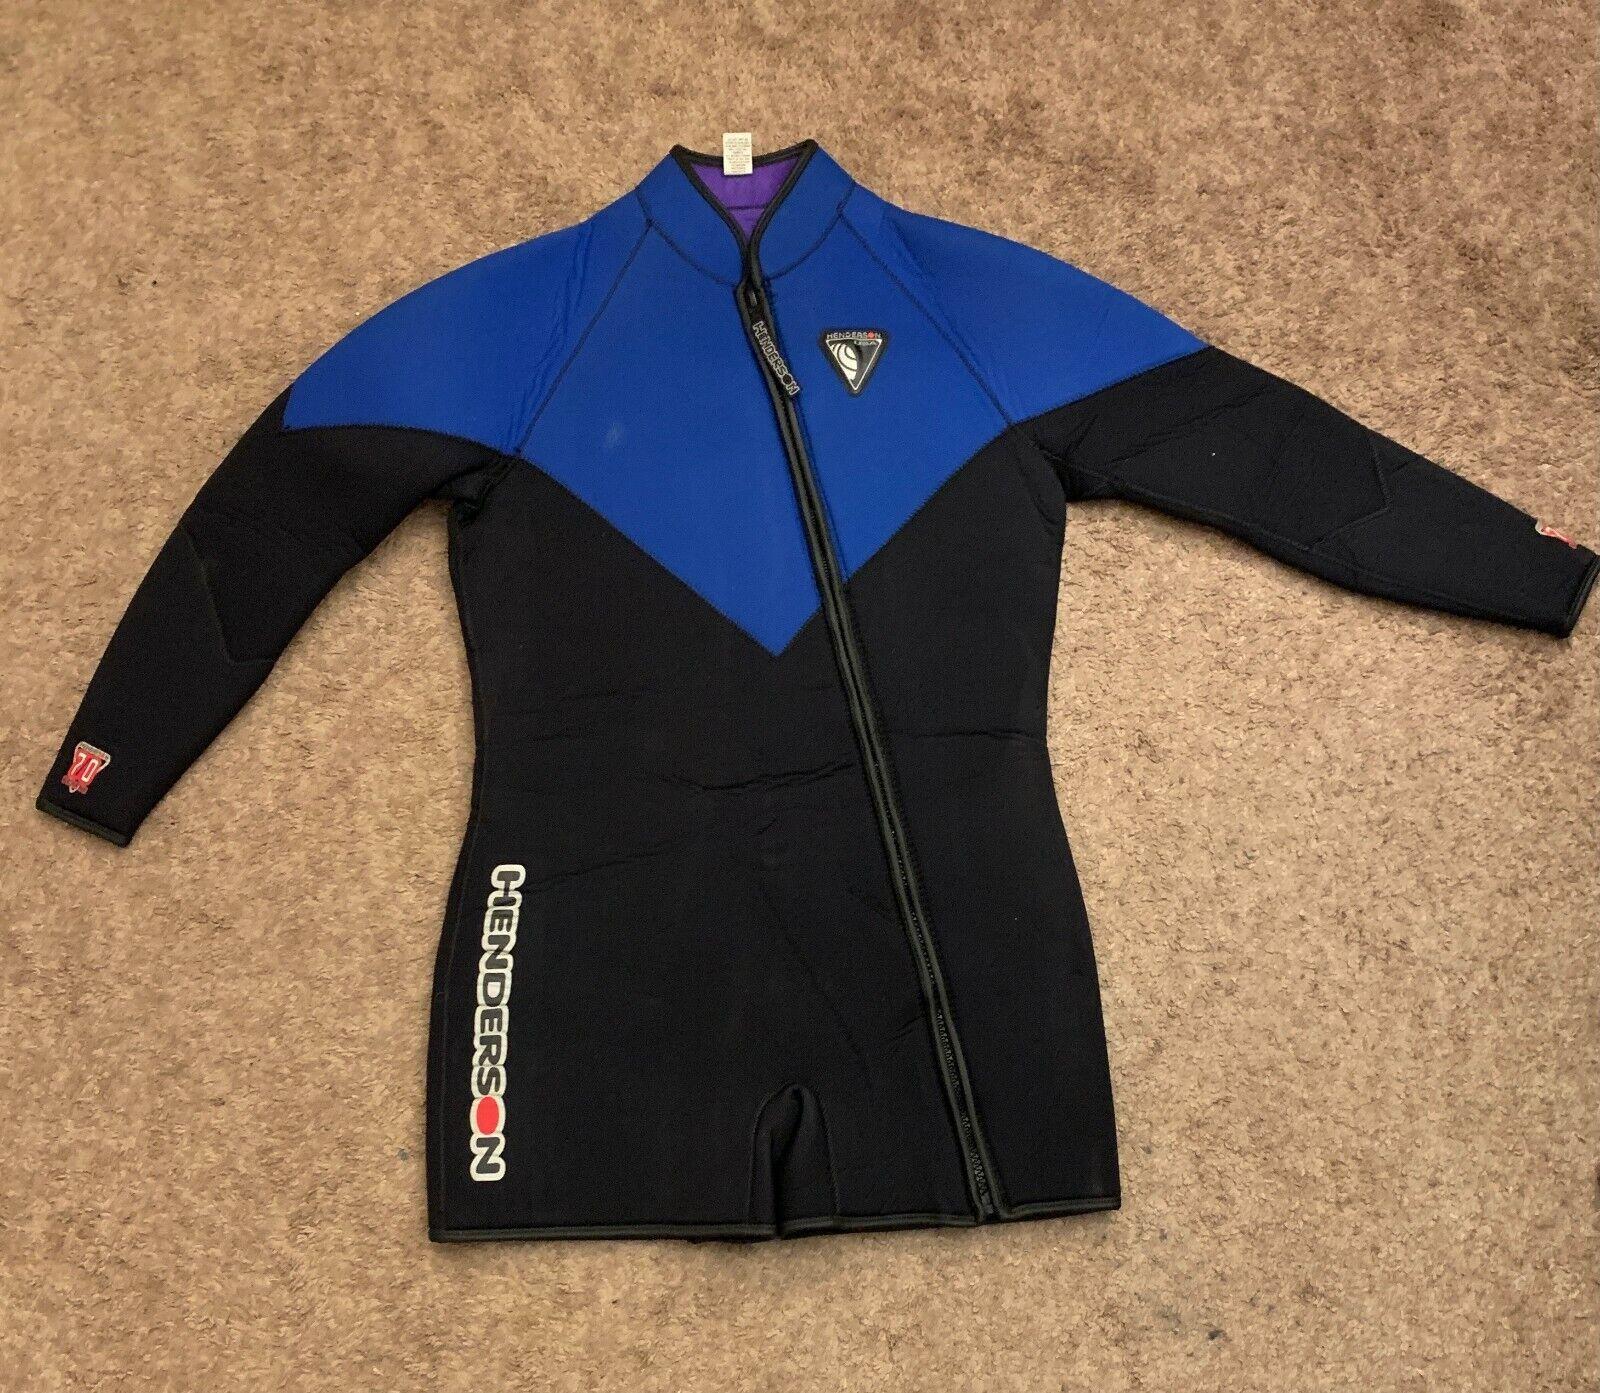 Henderson 2 Piece 7mm Wetsuit Size XL with Size L U.S. Diver